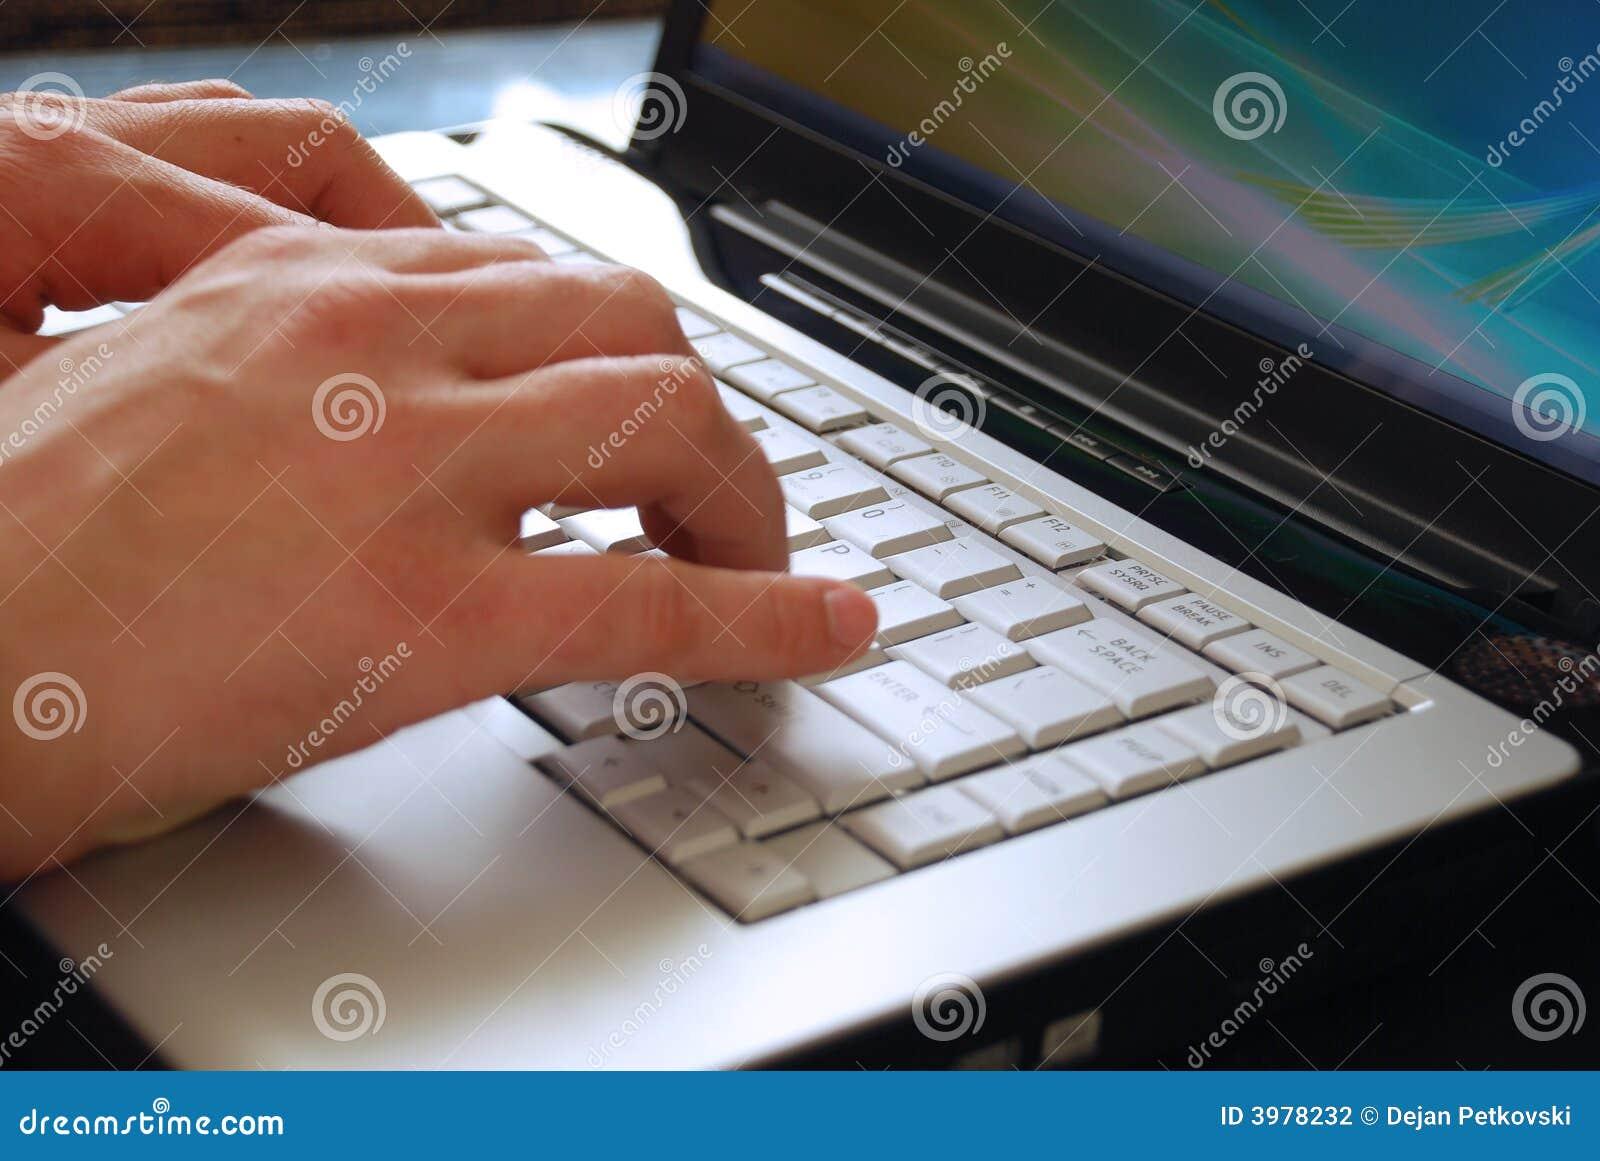 Taper sur un ordinateur portatif